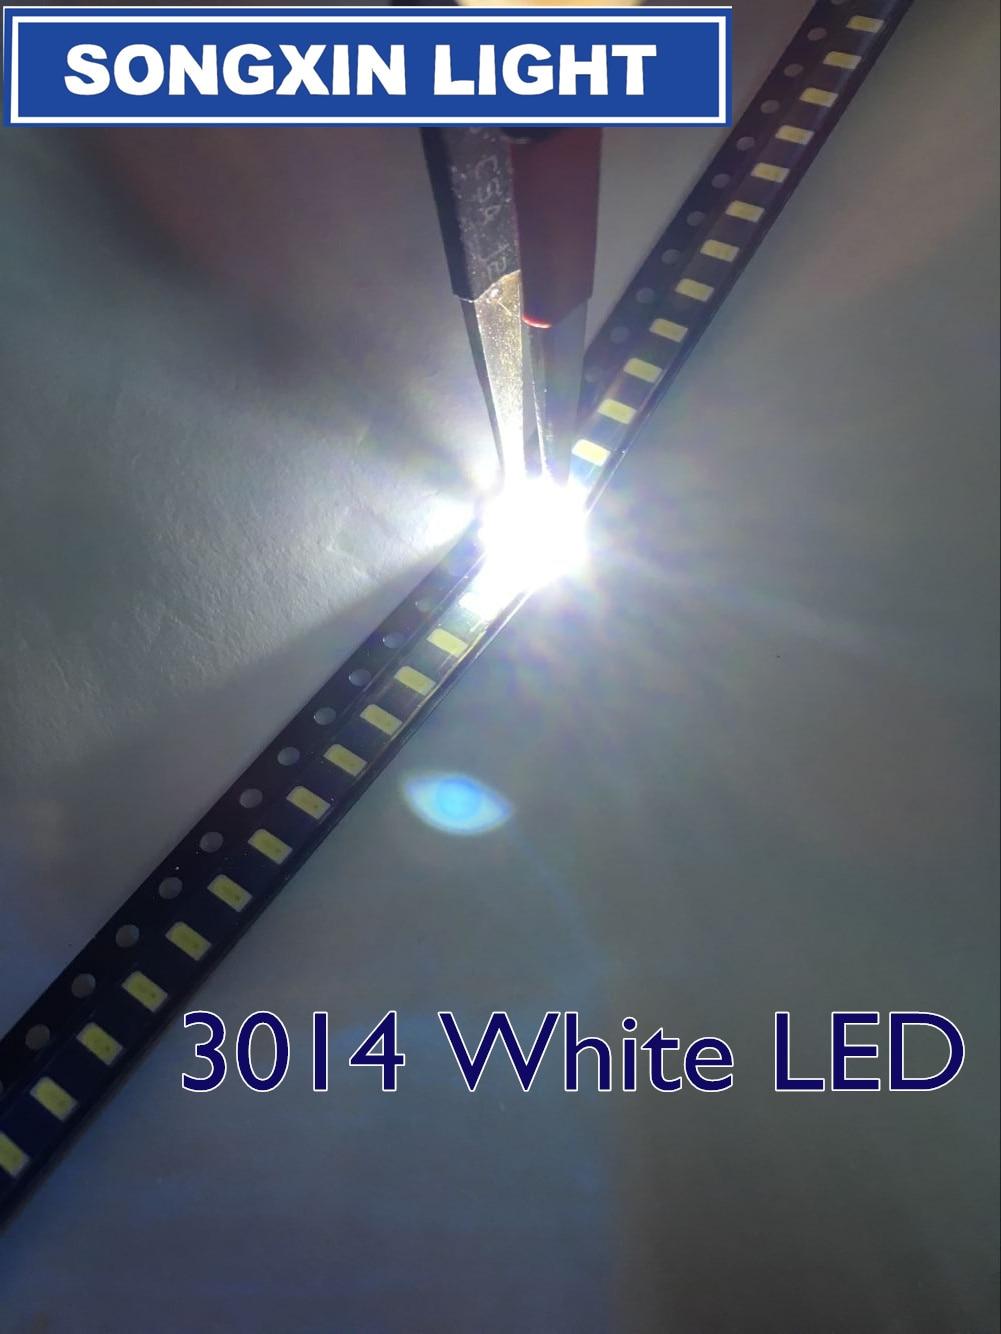 4000pcs 2835 LED Chip Warm White SMD Surface Mount 3V 60mA 0.2W 21-23LM Light